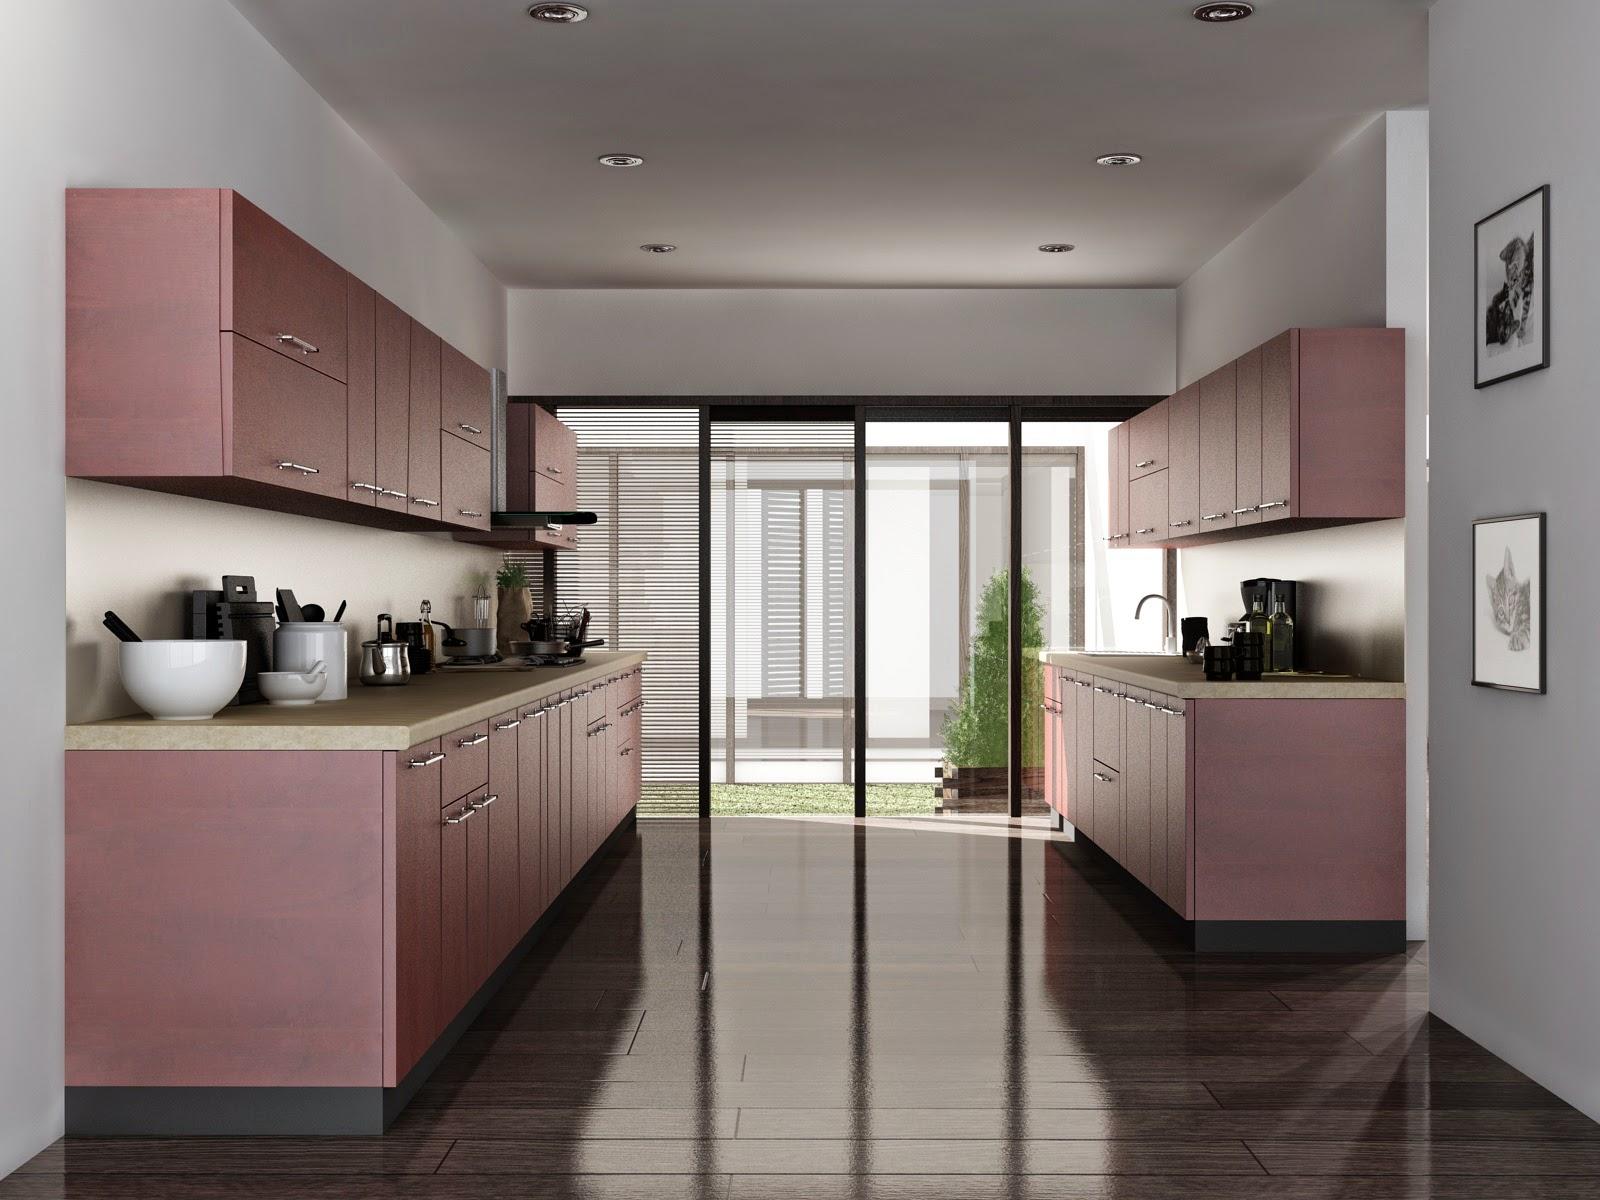 Pramukh modular kitchen for Parallel modular kitchen designs india